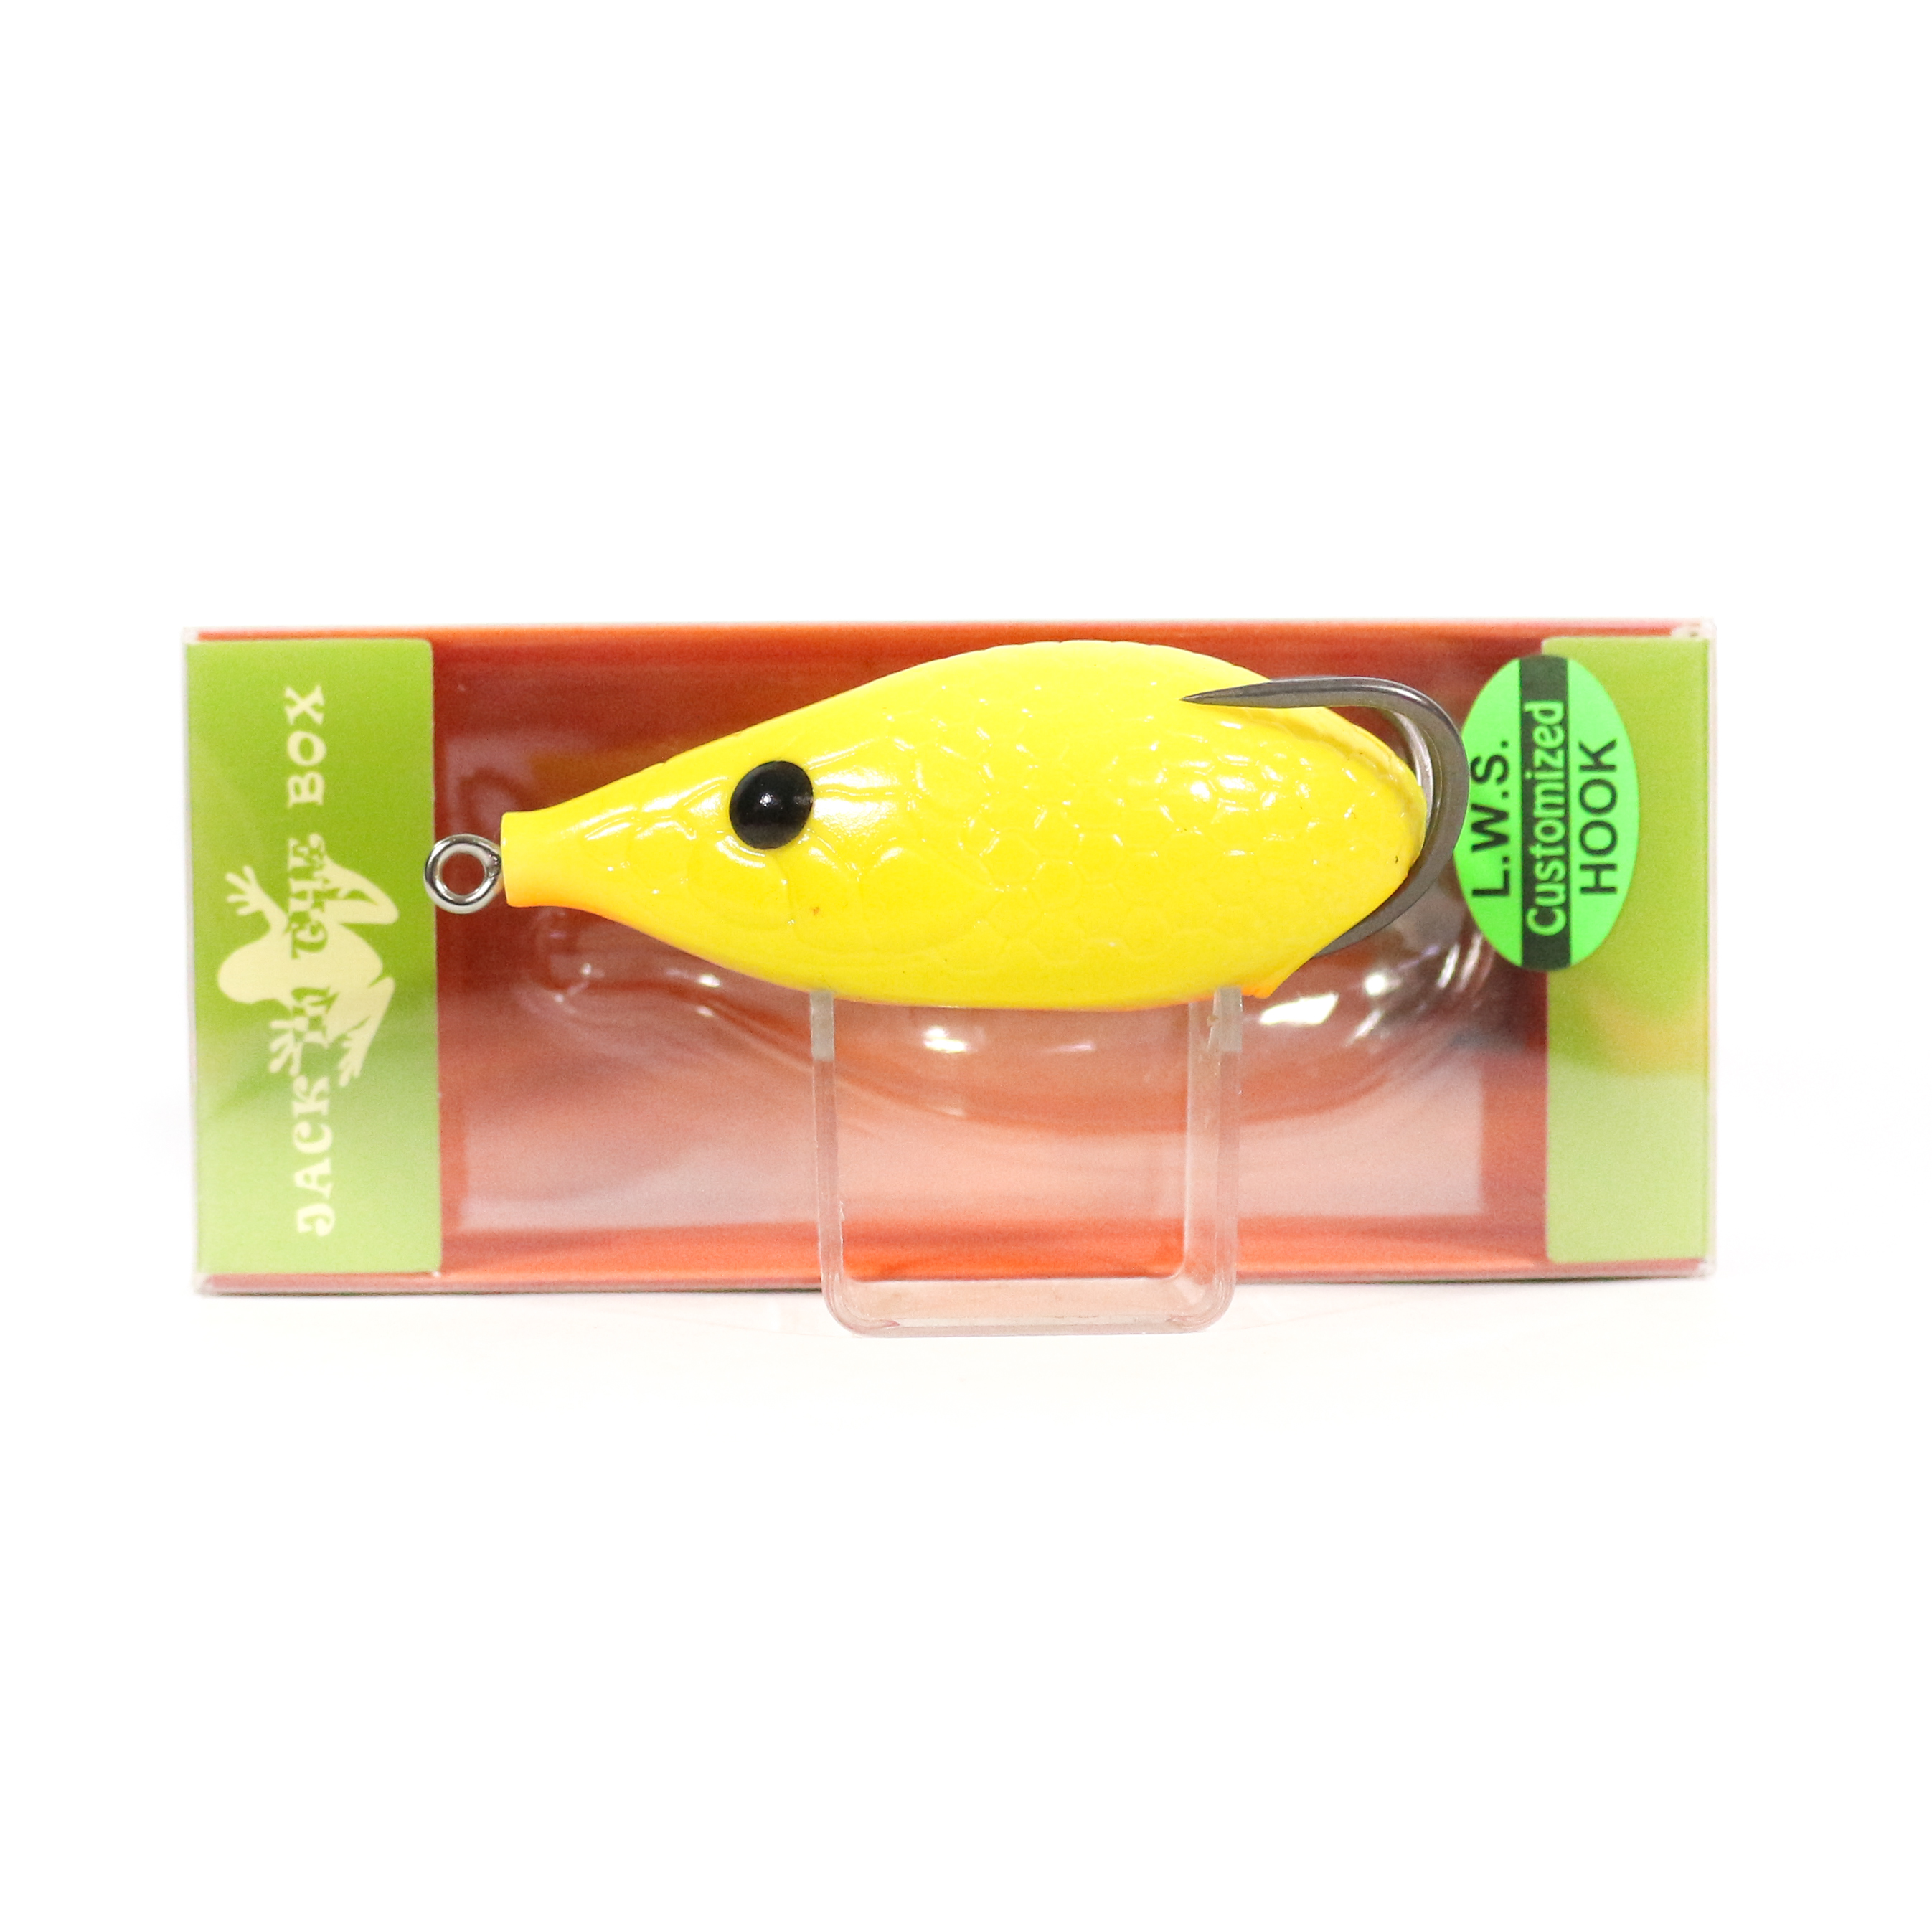 Finesse Tiny Anaconda Soft Plastic Floating Lure 28 (9575)